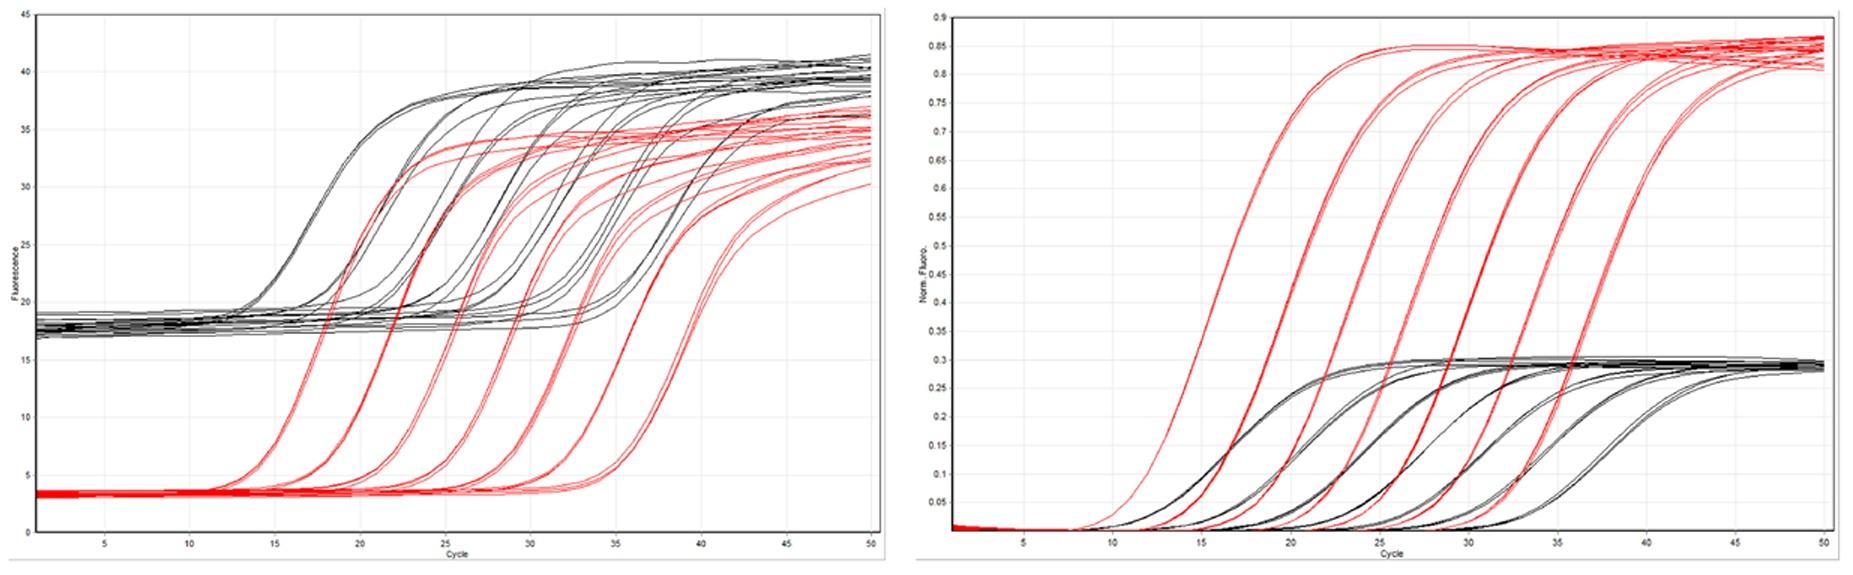 standard-bhq-probes-vs-bhq-nova-probes-side-by-side.jpg